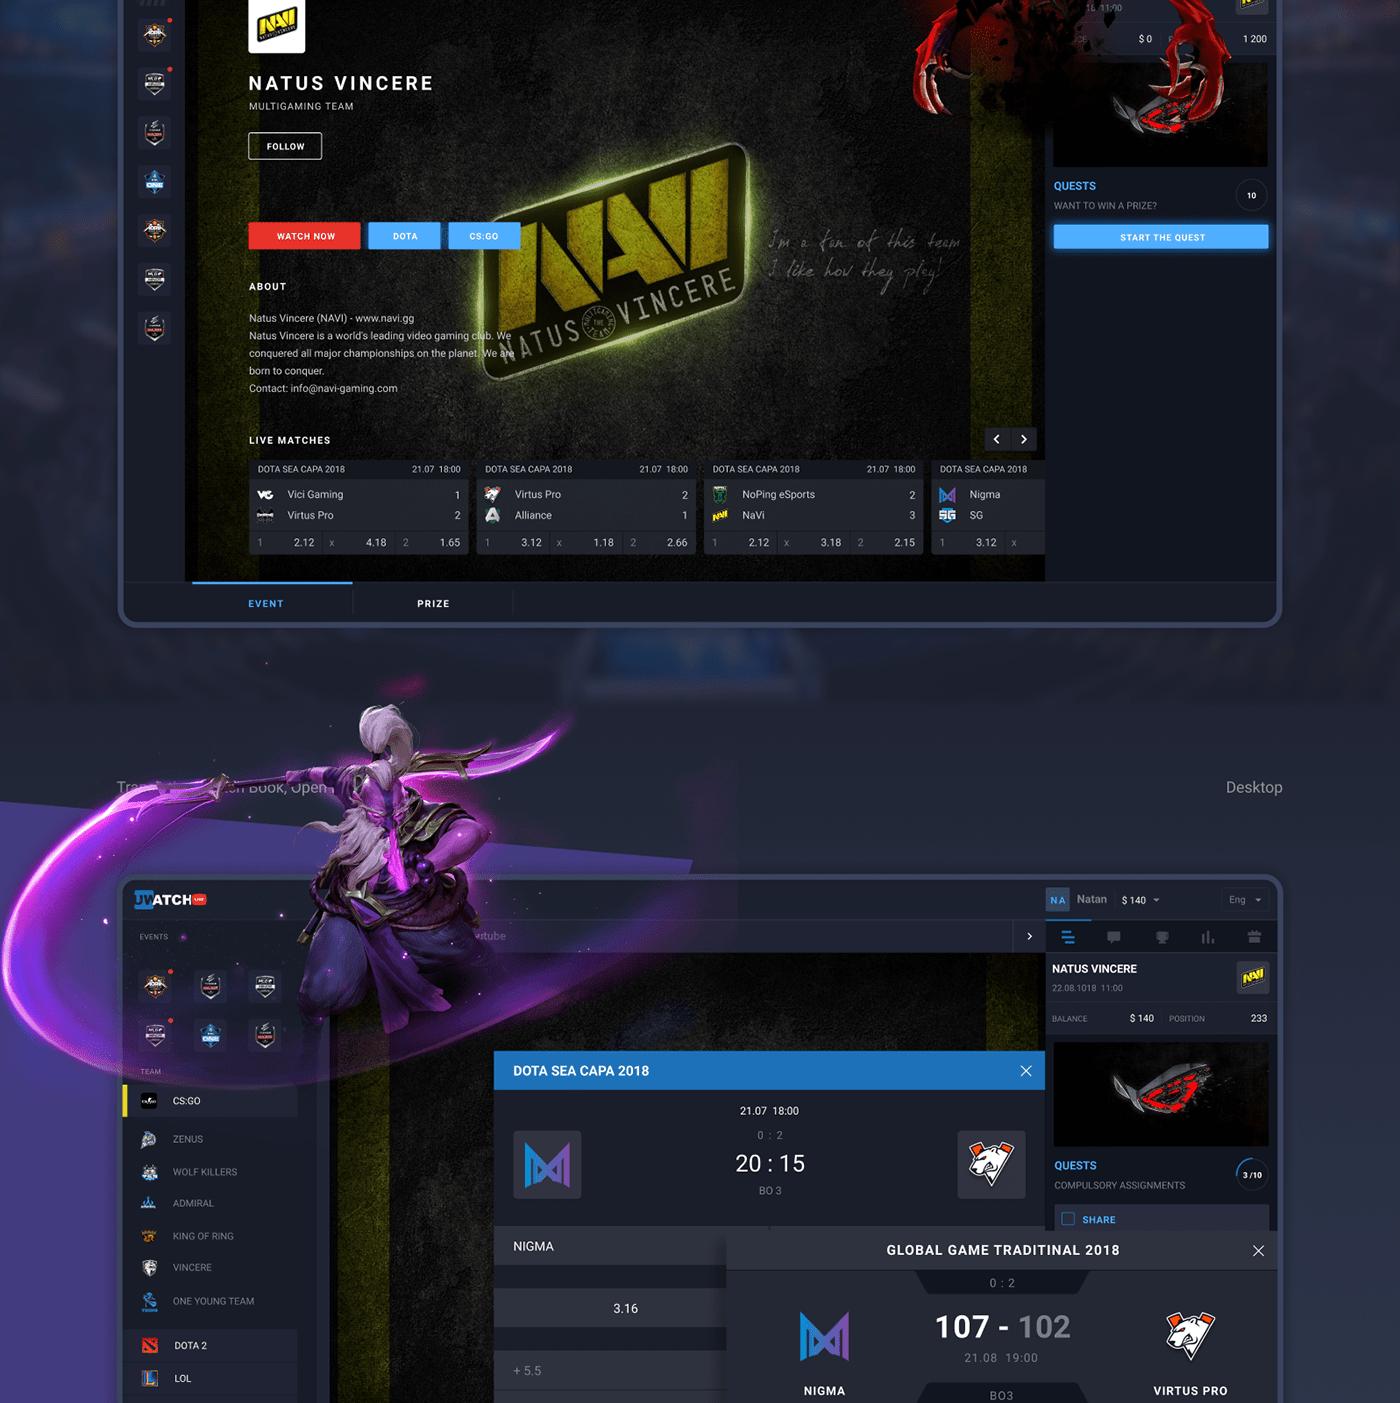 Image may contain: screenshot, monitor and pc game